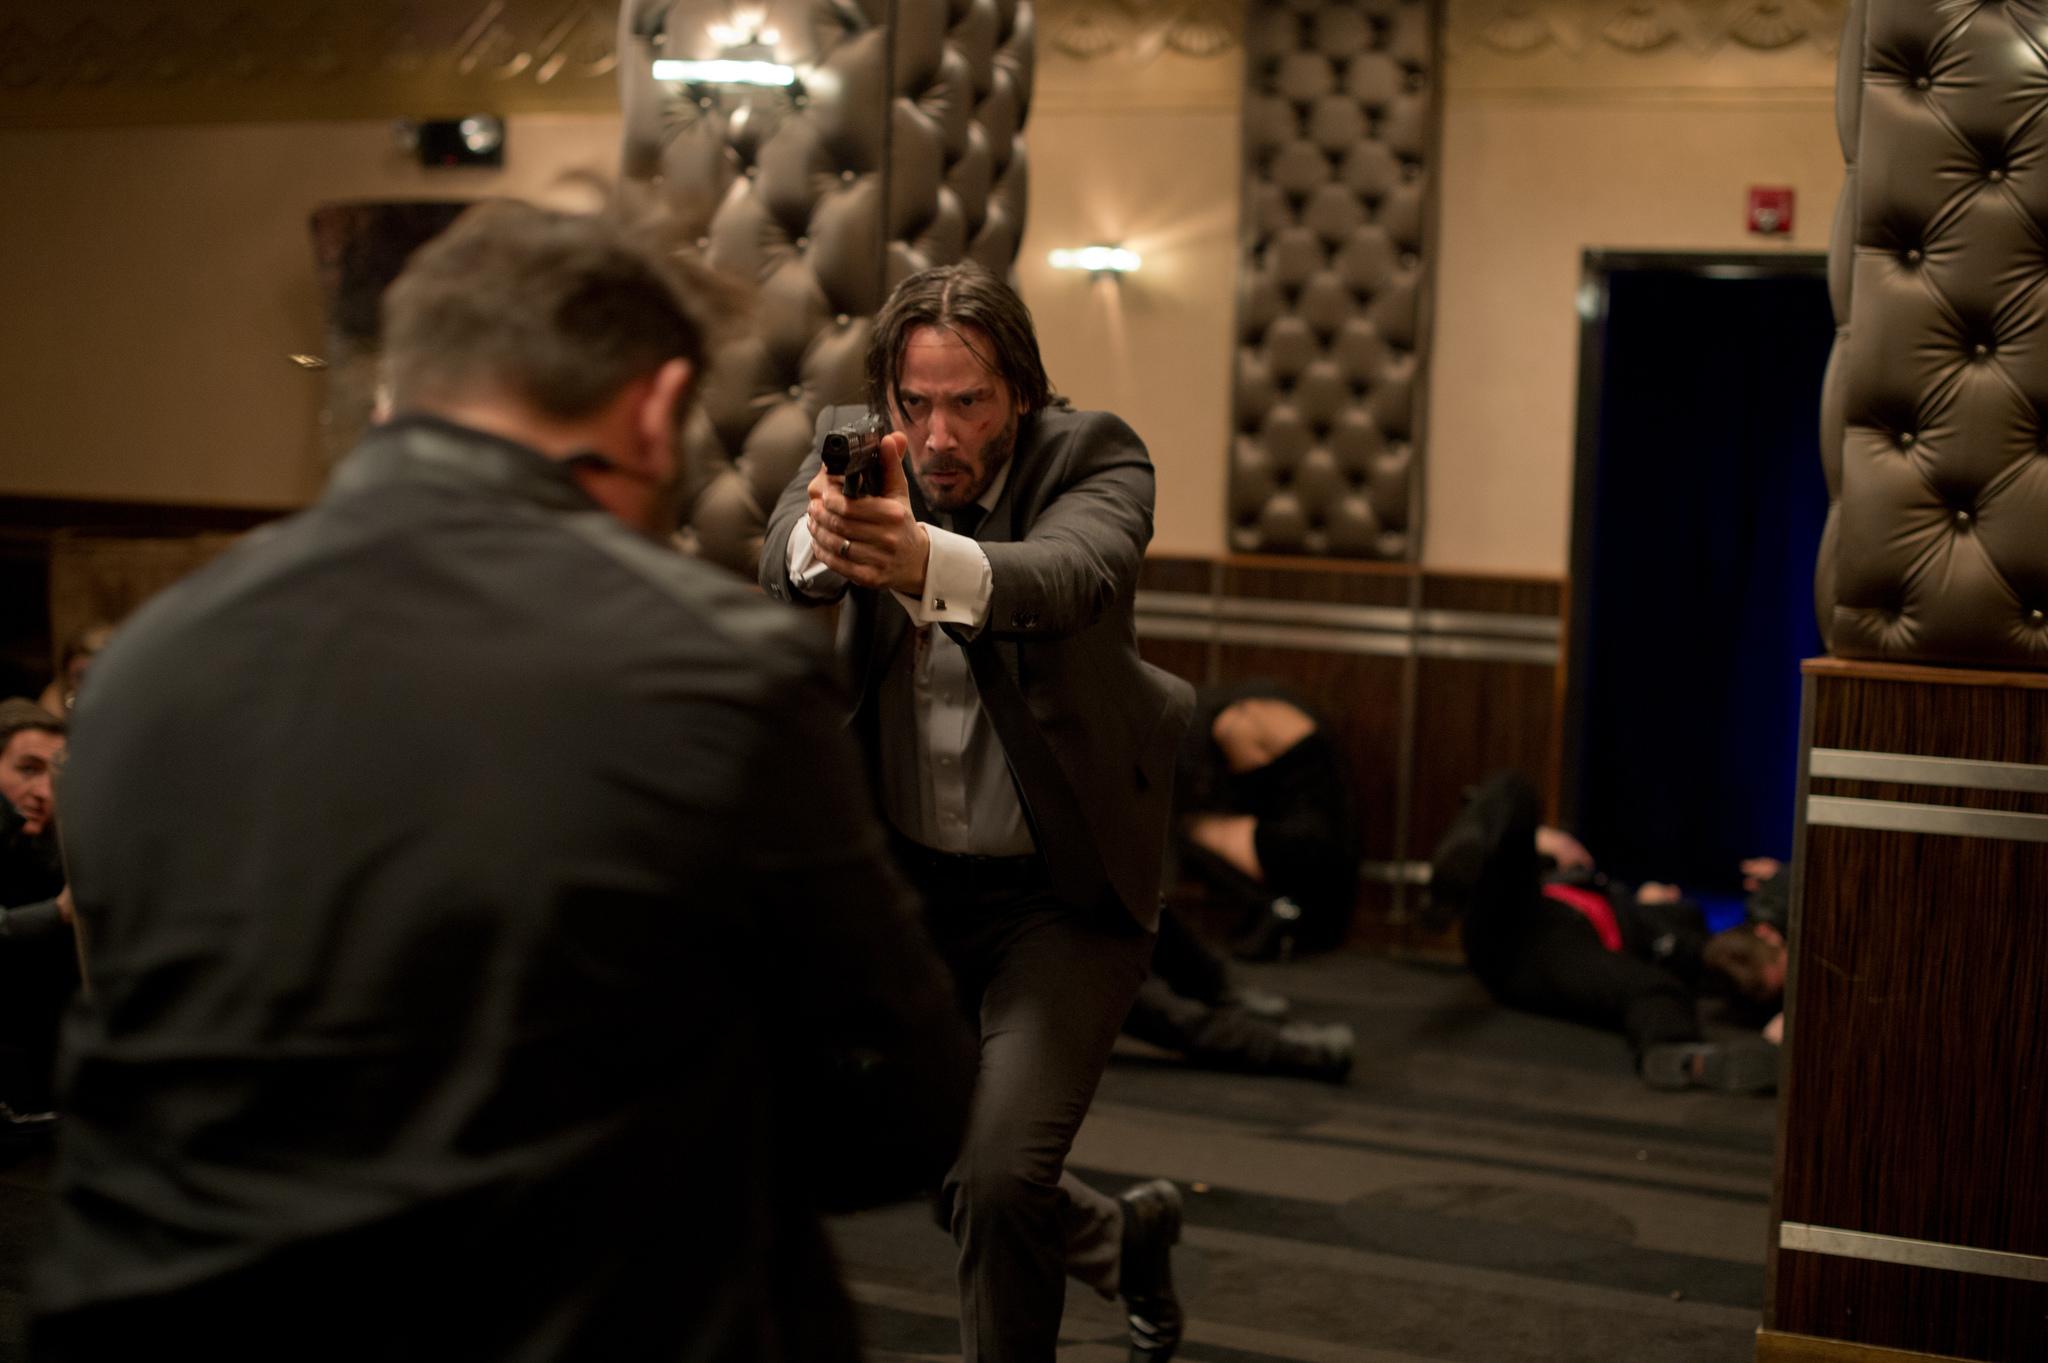 john wick 2014 photo gallery imdb